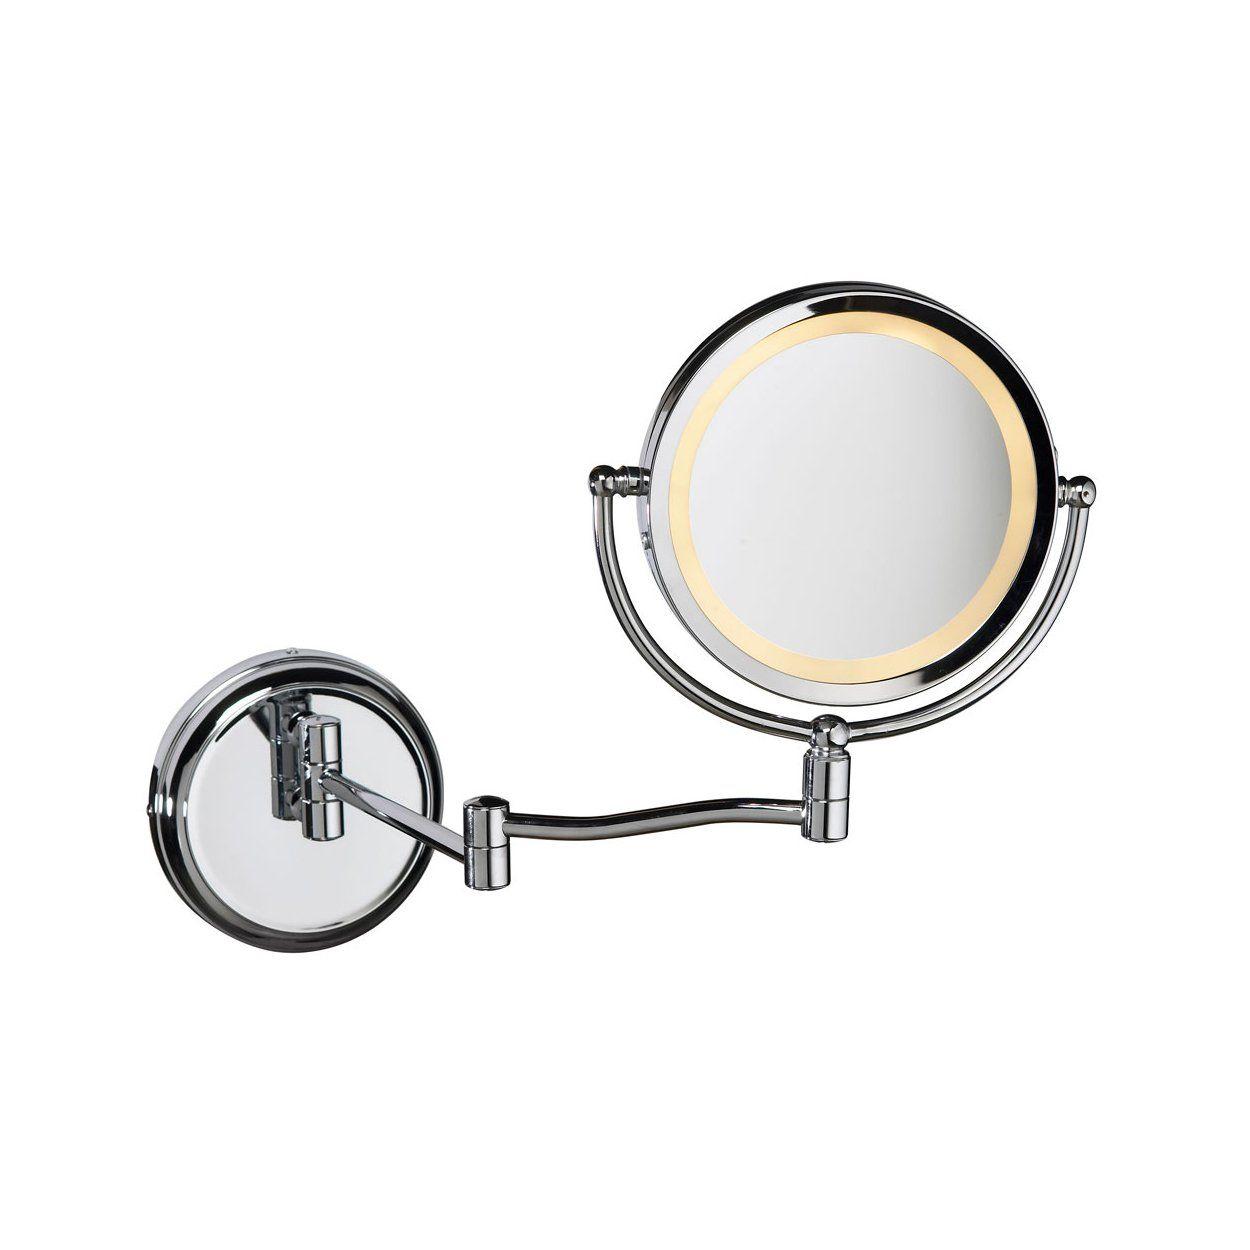 Dainolite Lighting Magmir 1w Magnified Make Up Mirror Lowe S Canada Main Bathroom